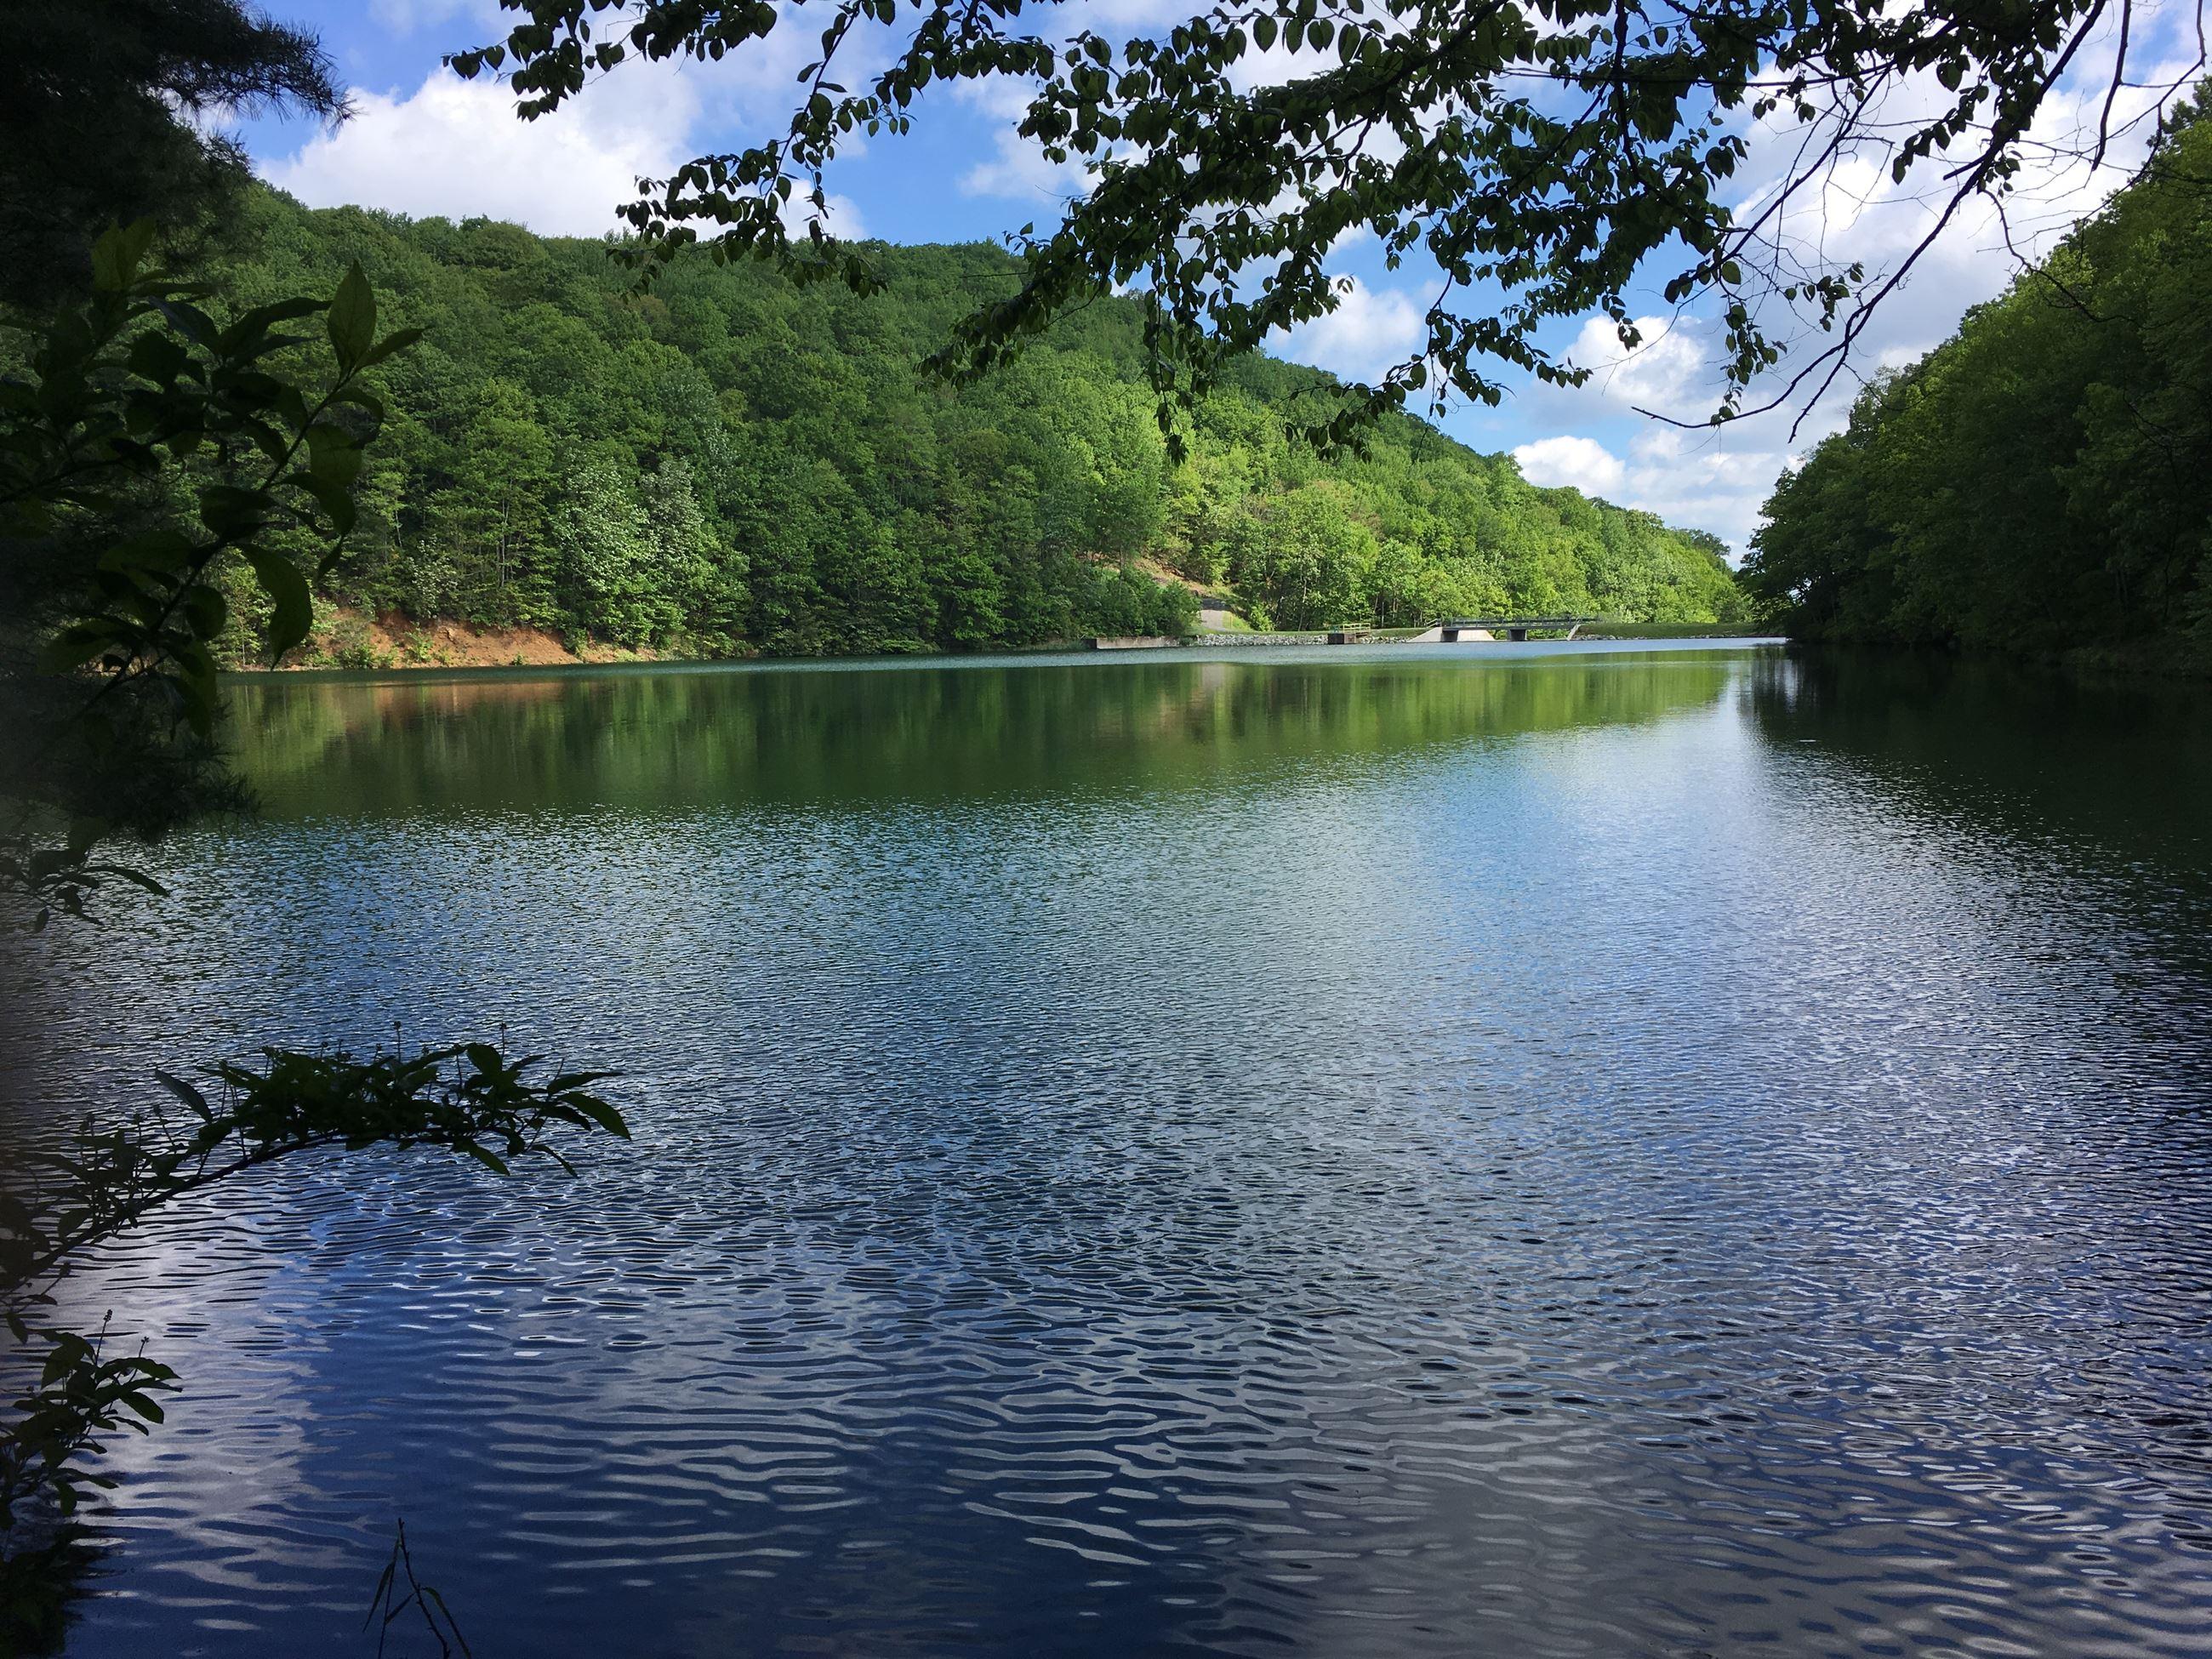 Fish | Norton, VA - Official Website